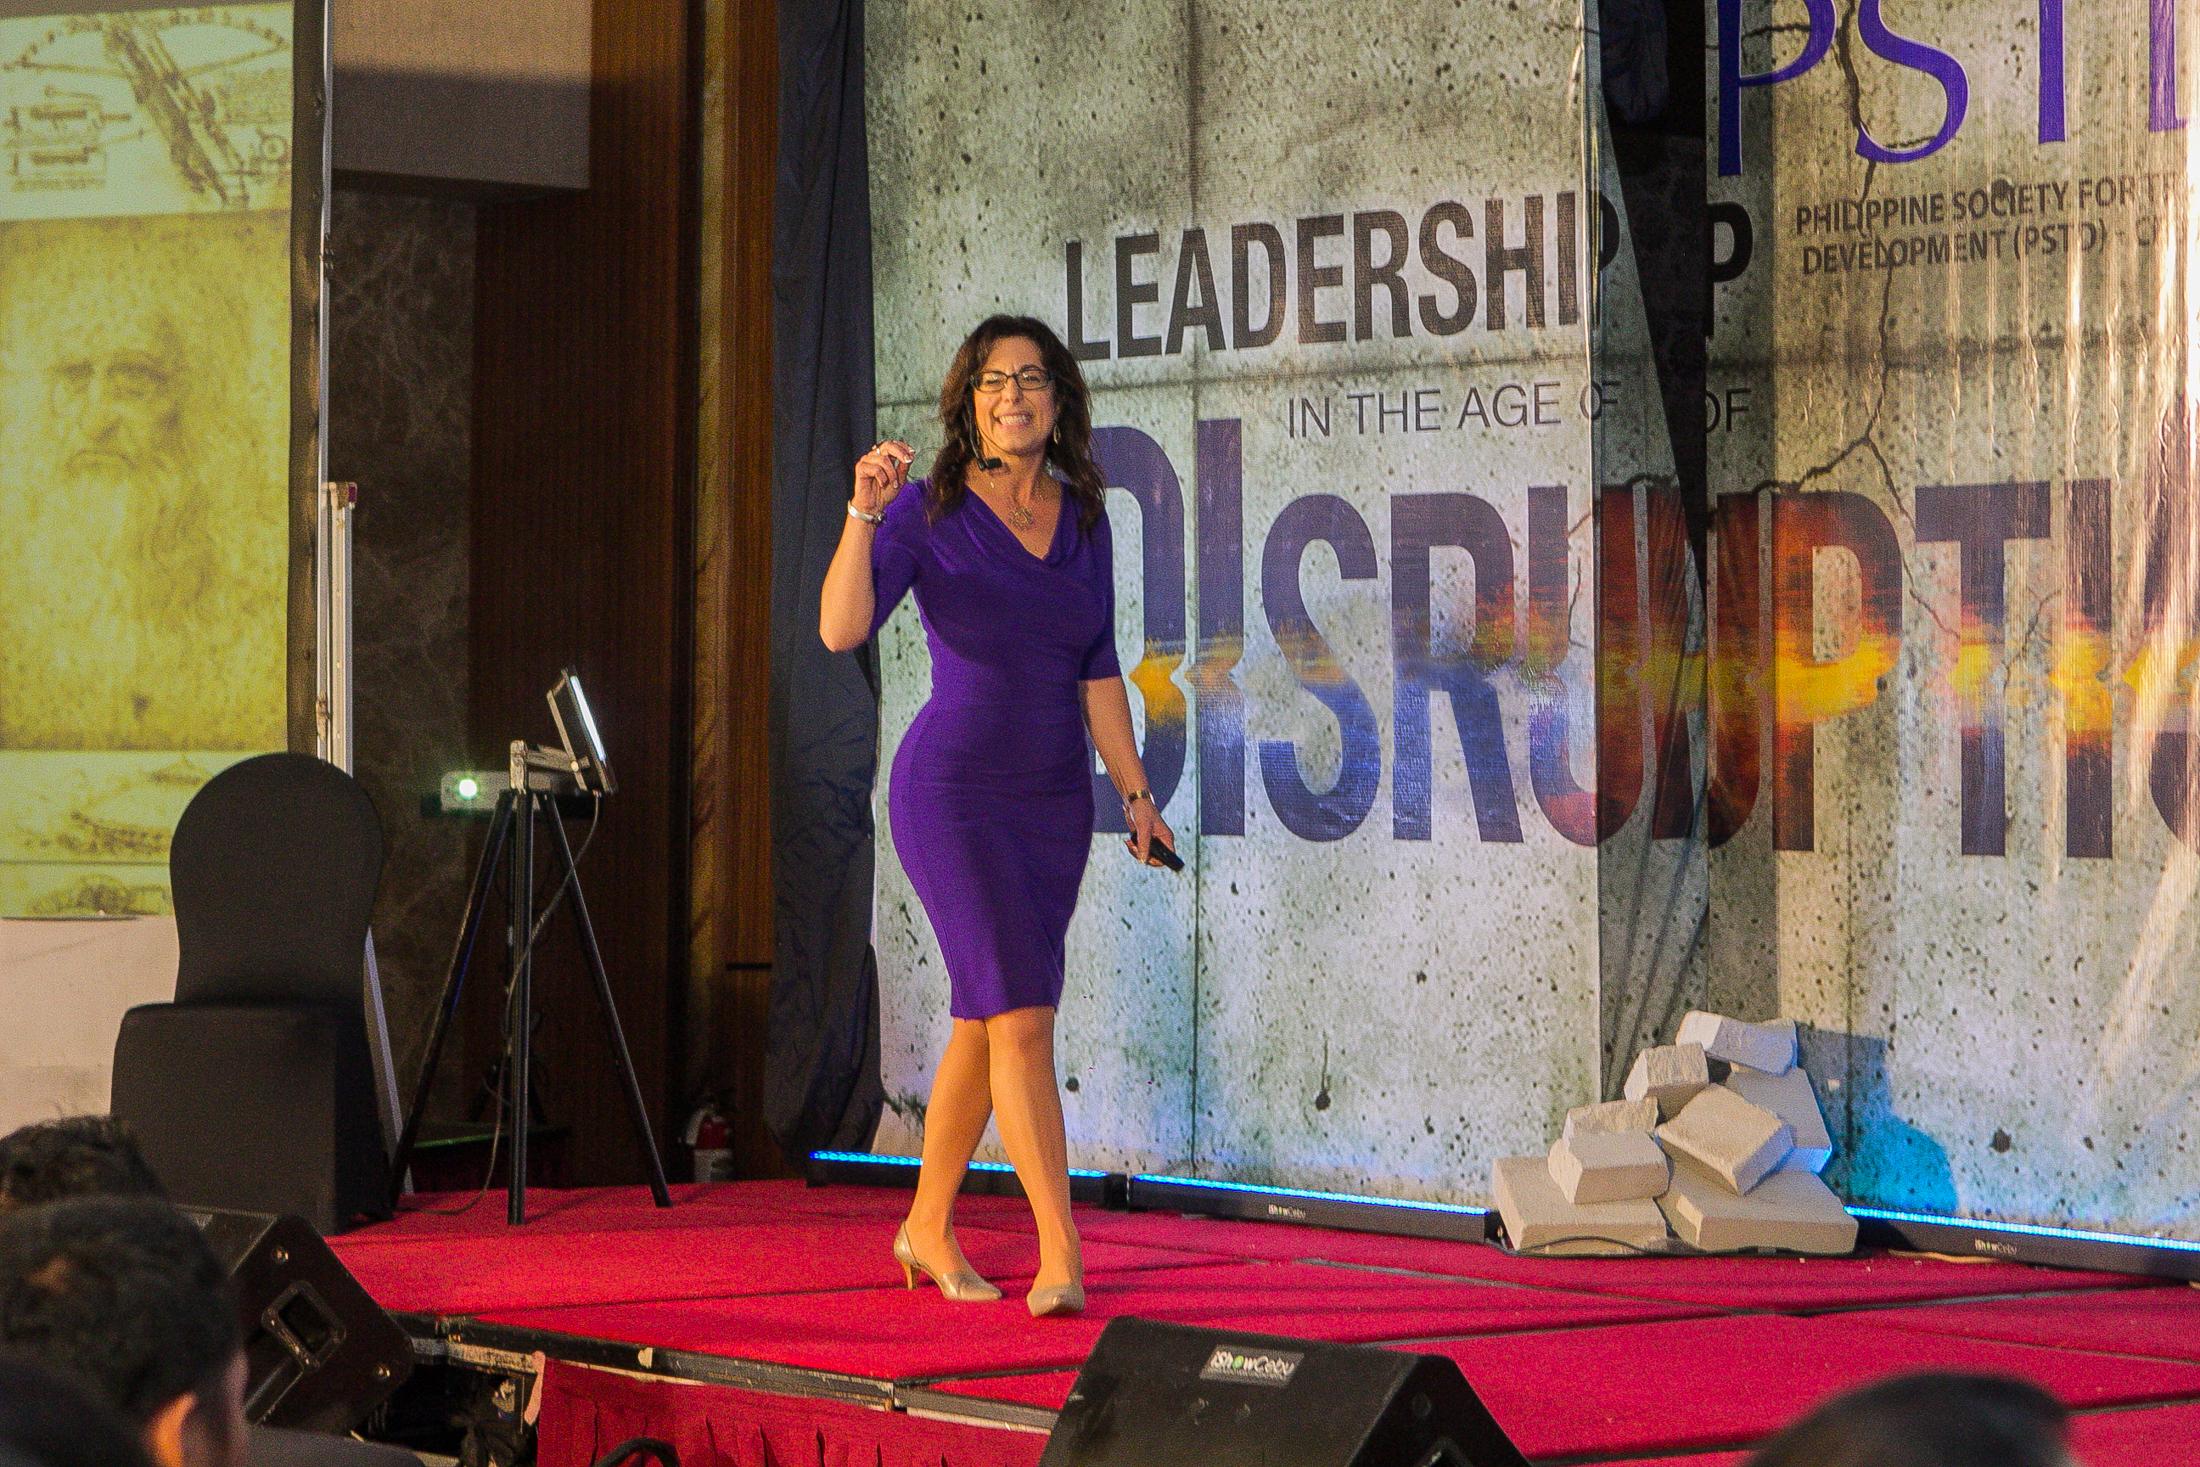 Jean Marie DiGiovanna leading a workshop on leadership and disruption. (Credit: Jovenir Bataican)